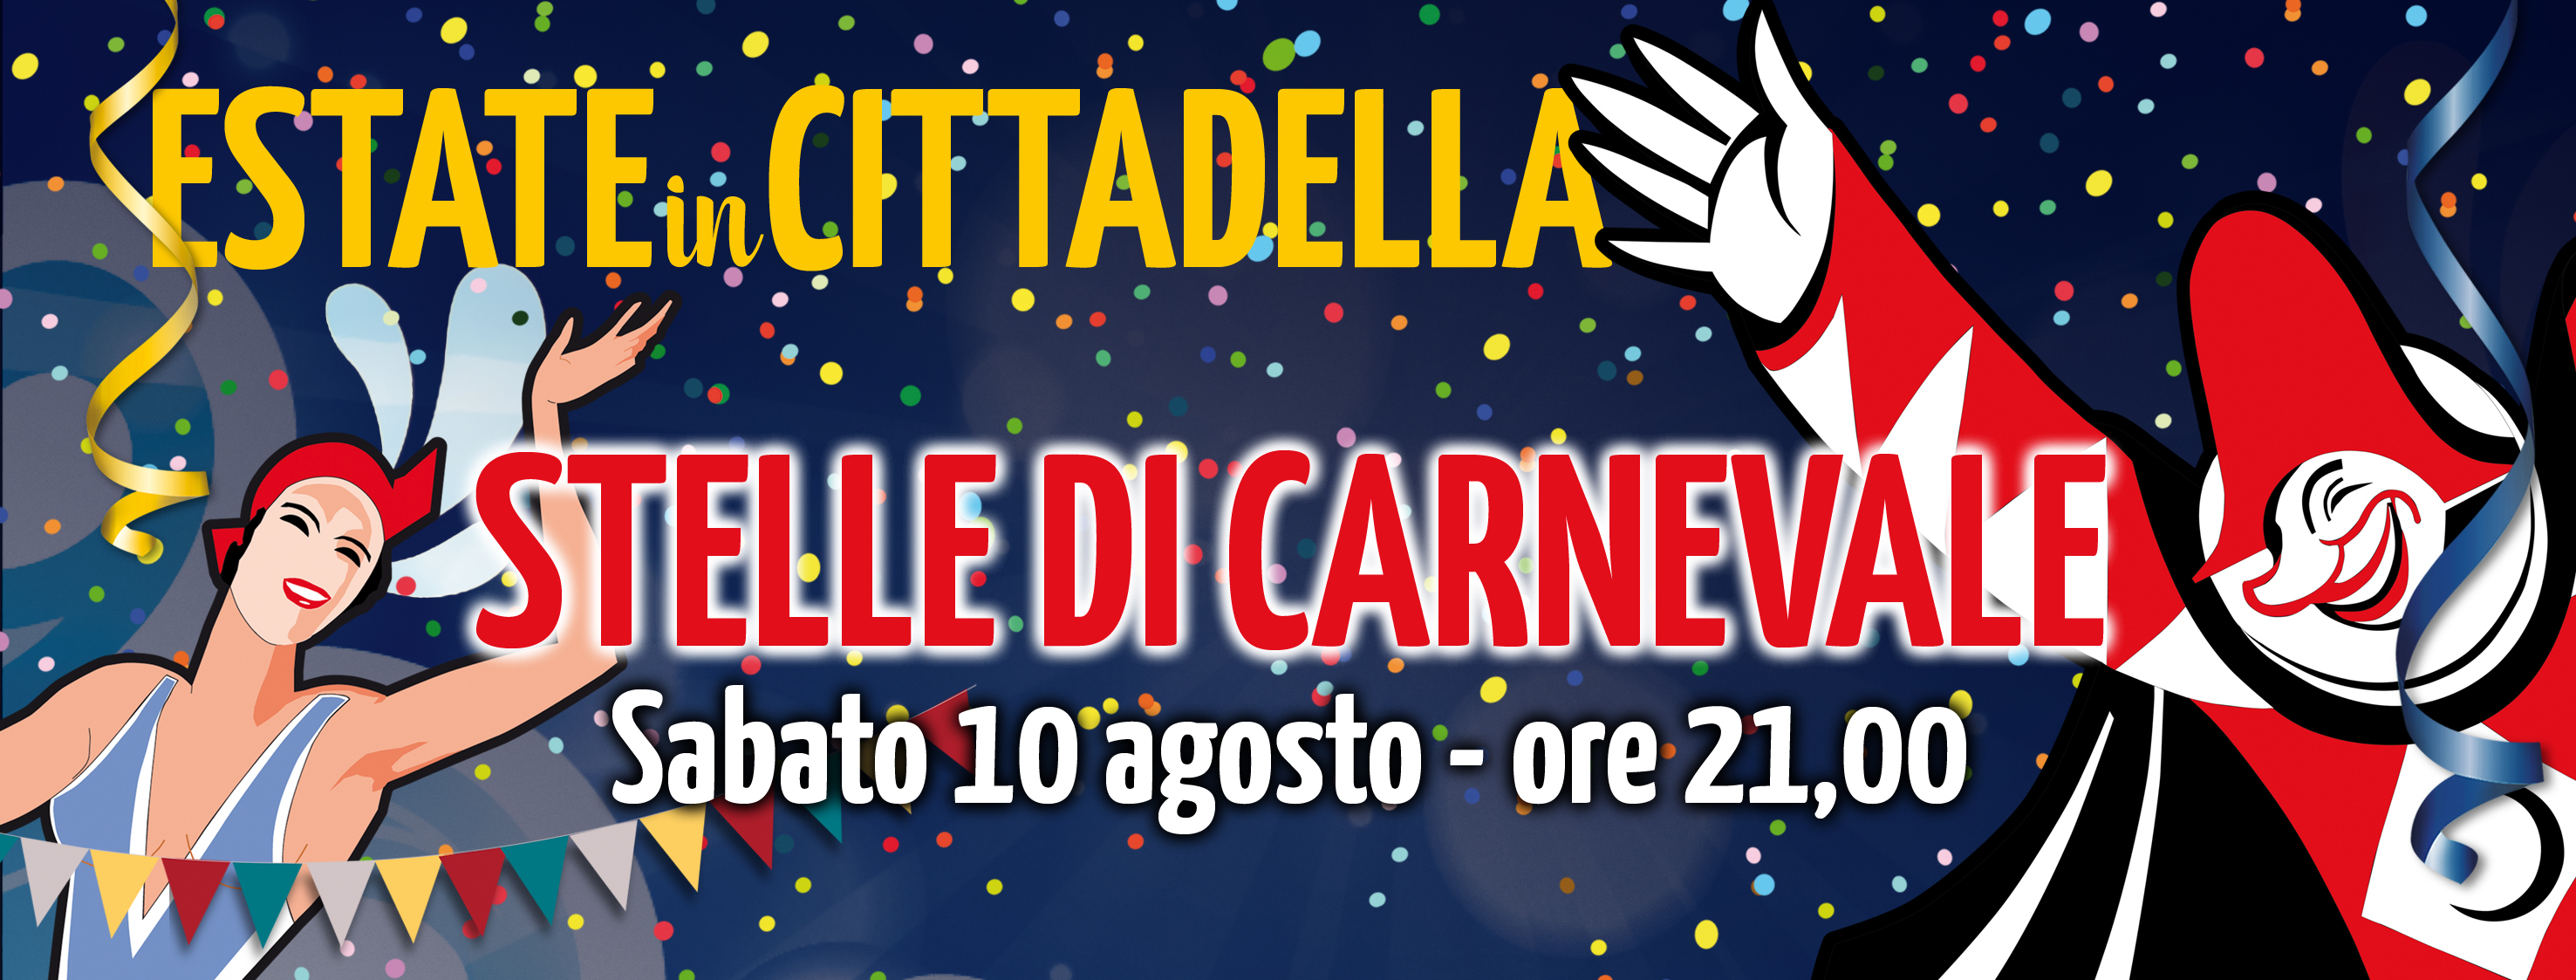 Calendario Carnevale Viareggio 2020.Stelle Di Carnevale Carnevalari It